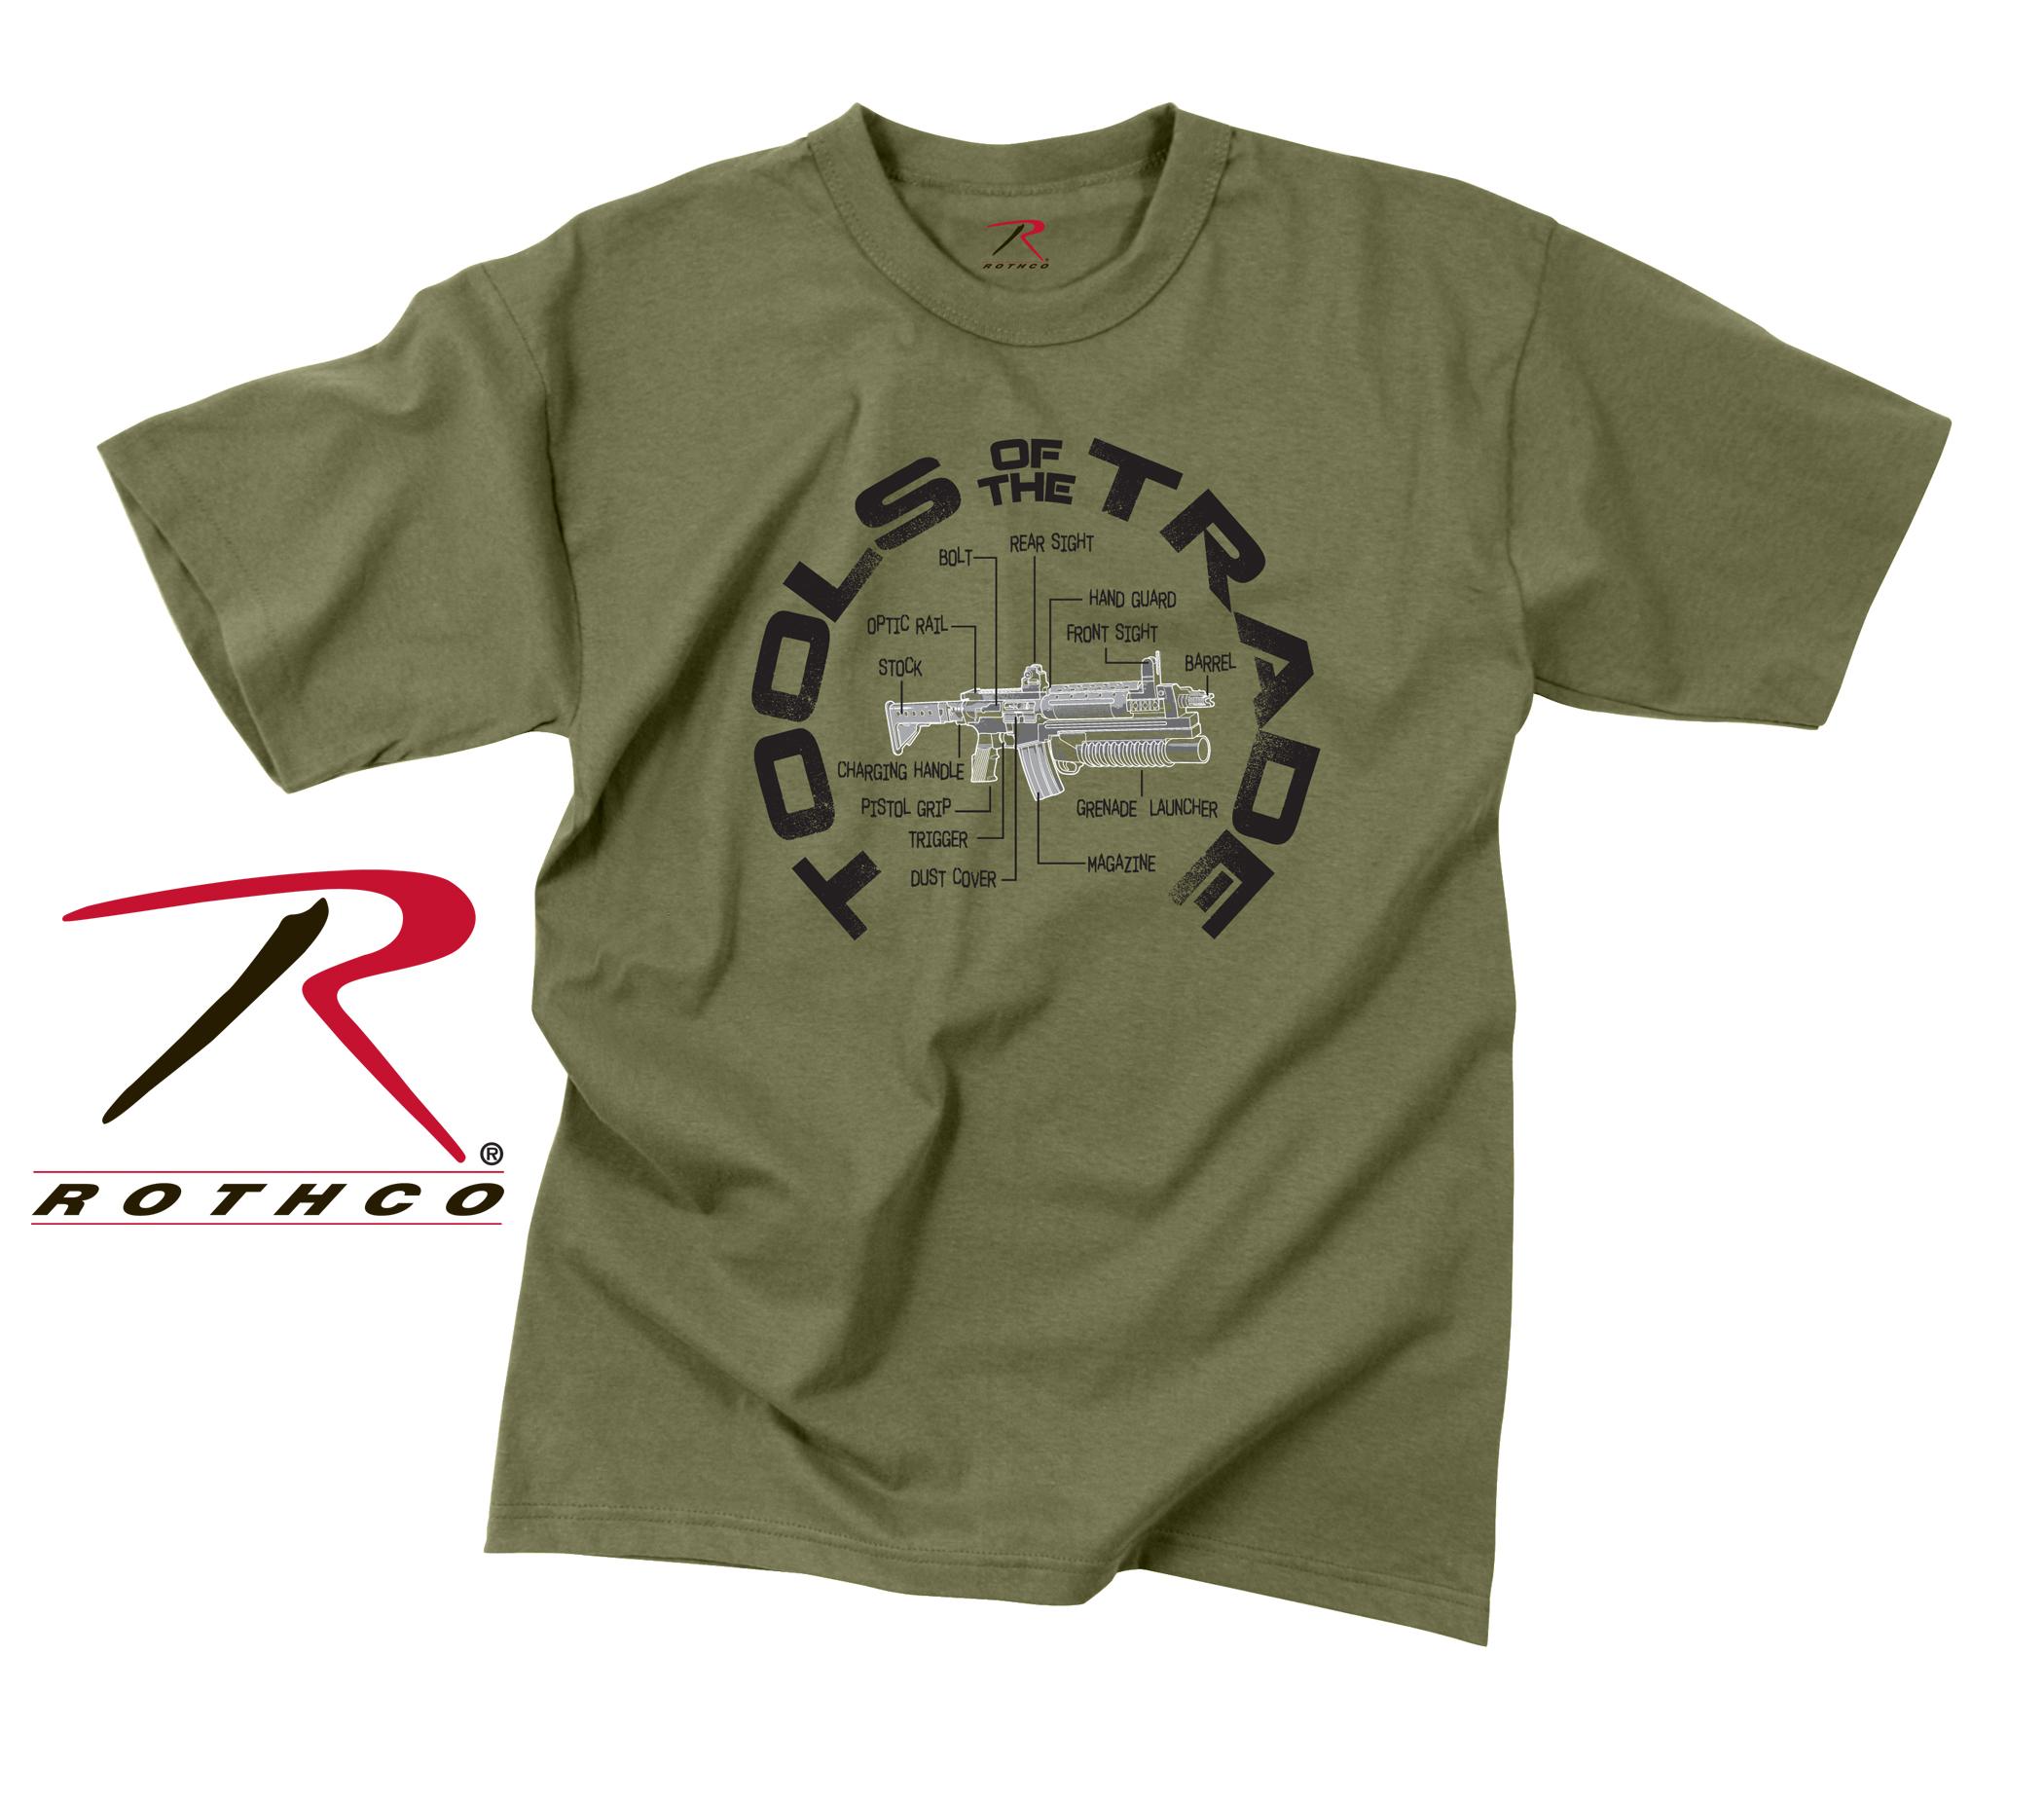 Rothco vintage tools of the trade t shirt for Trade t shirt printing